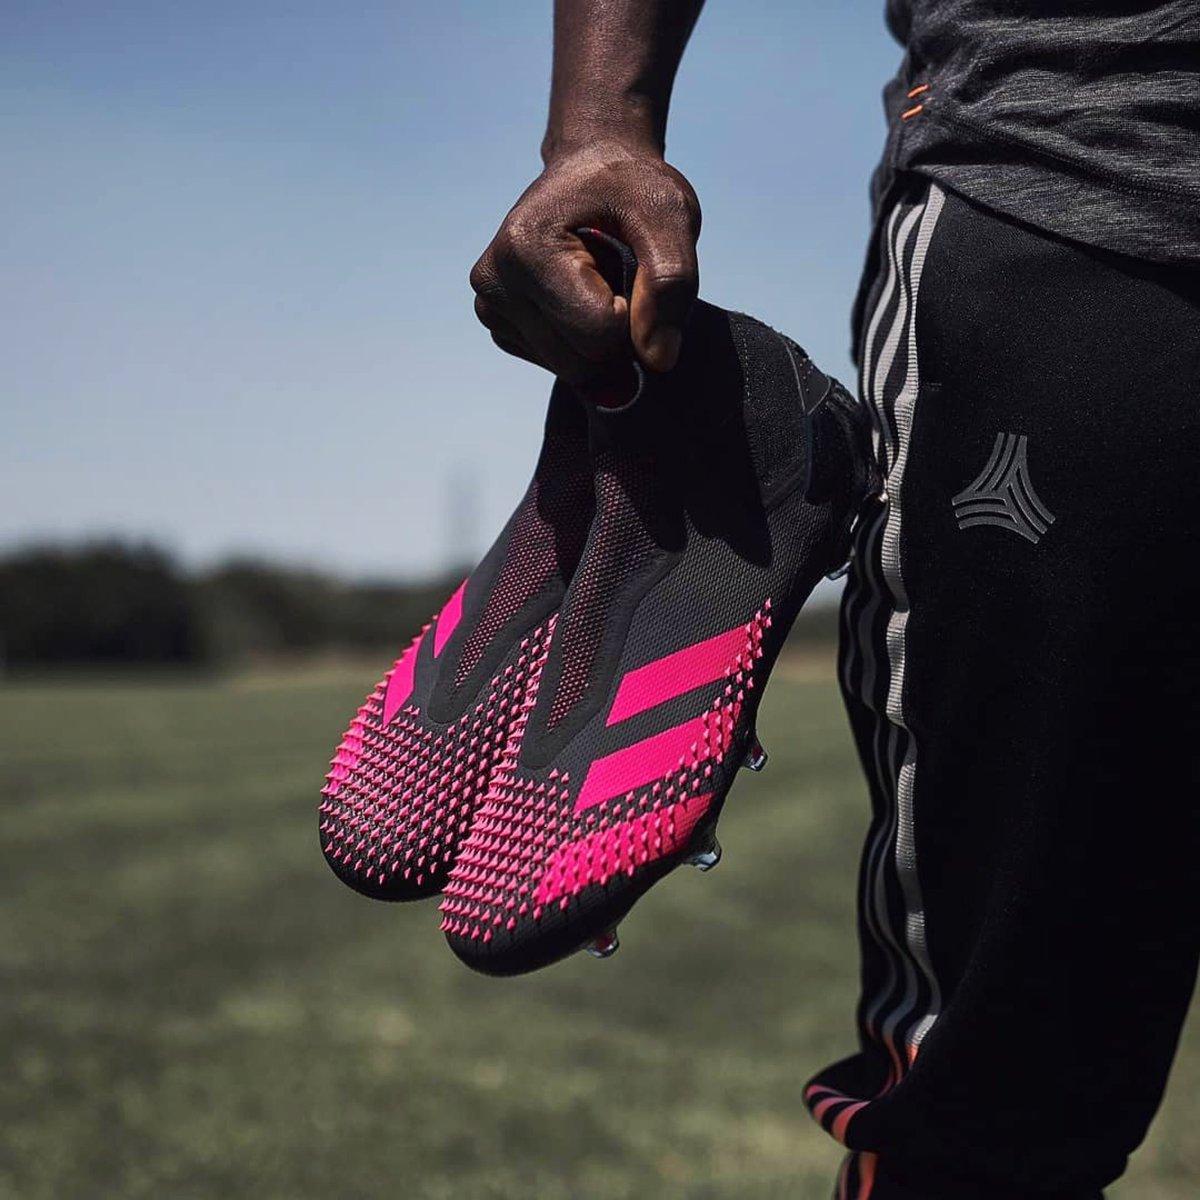 "adidas Predator 20+ ""Black/Pink"" - une exclusivité Pro:Direct Soccer 👅 - #ProDirect #adidasFootball #adidasPredator #Predator20 https://t.co/96RNKYE9VZ"